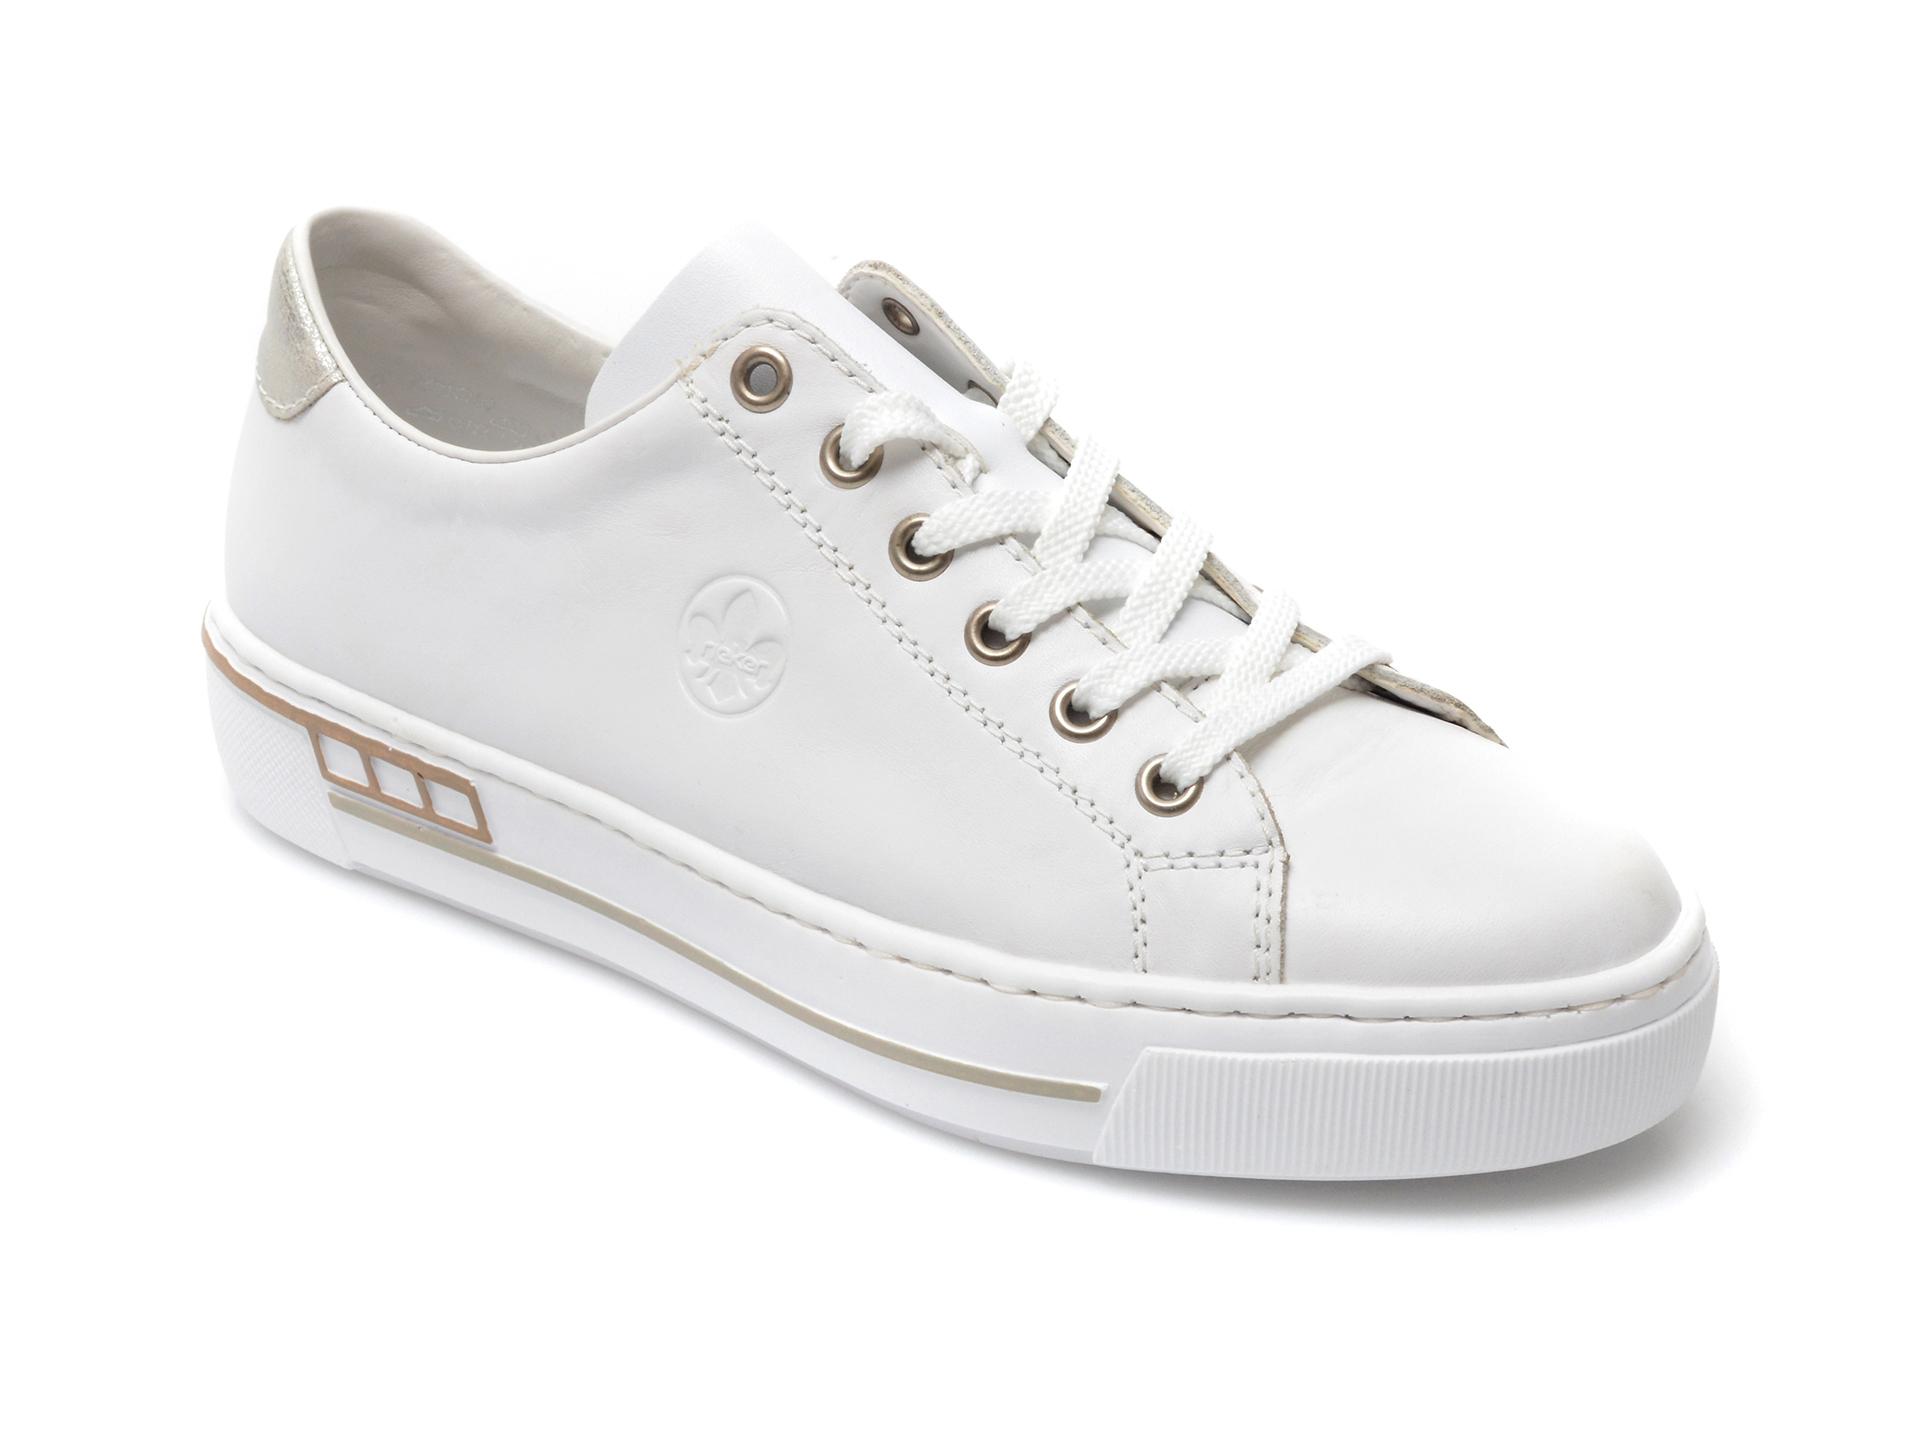 Pantofi sport RIEKER albi, L88W1, din piele ecologica imagine otter.ro 2021